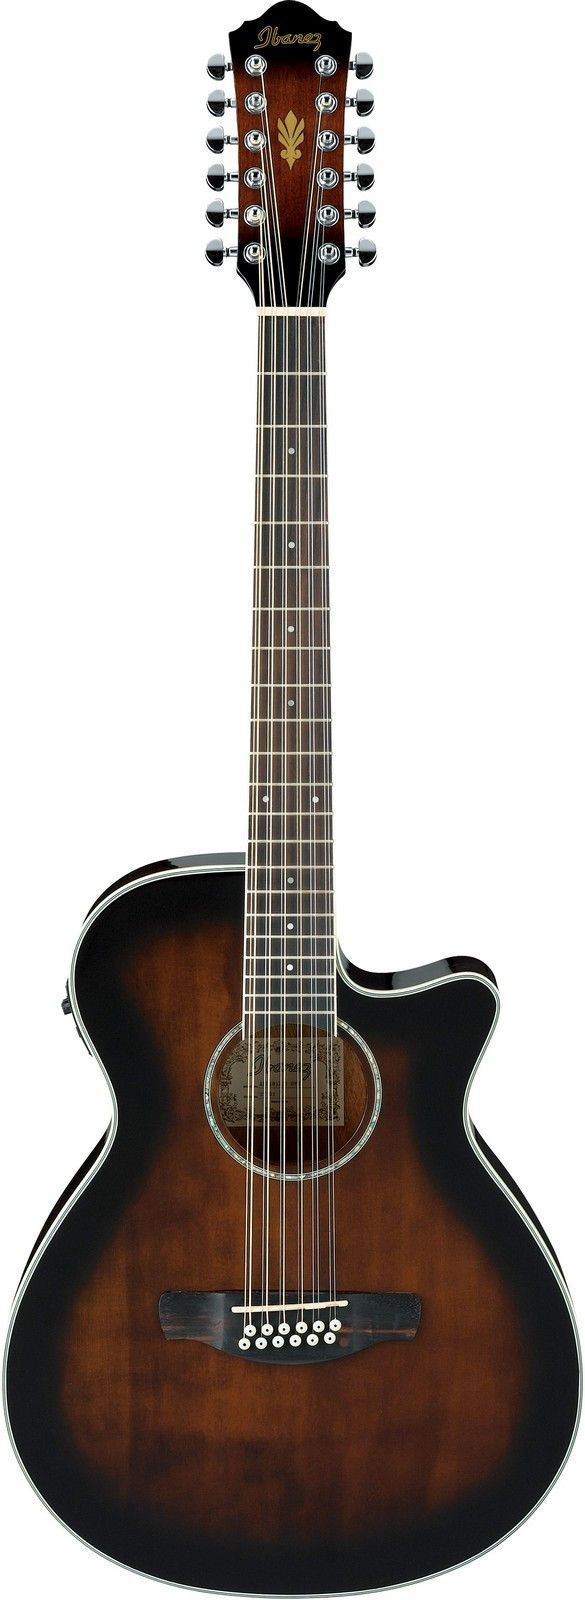 Ibanez AEG1812II 12-String Acoustic-Electric Guitar www.guitaristica.org #electricguitar #guitars #guitaristica